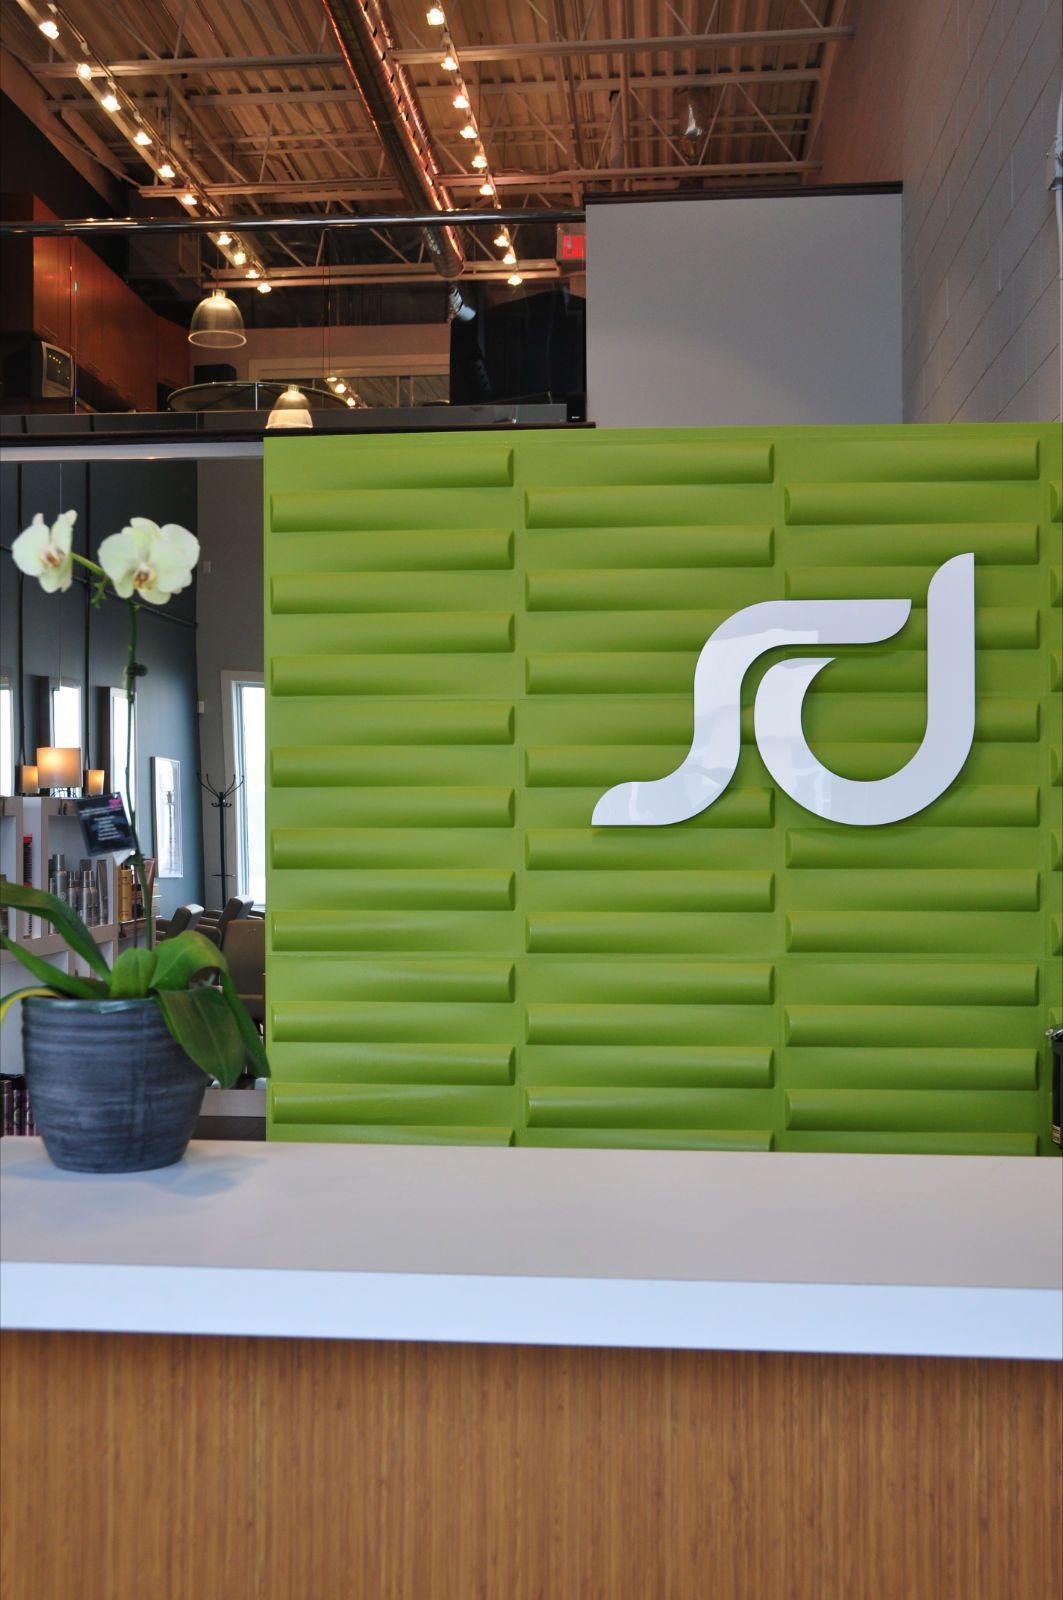 Salon Decorum Newmarket ON recycled bamboo tiles create